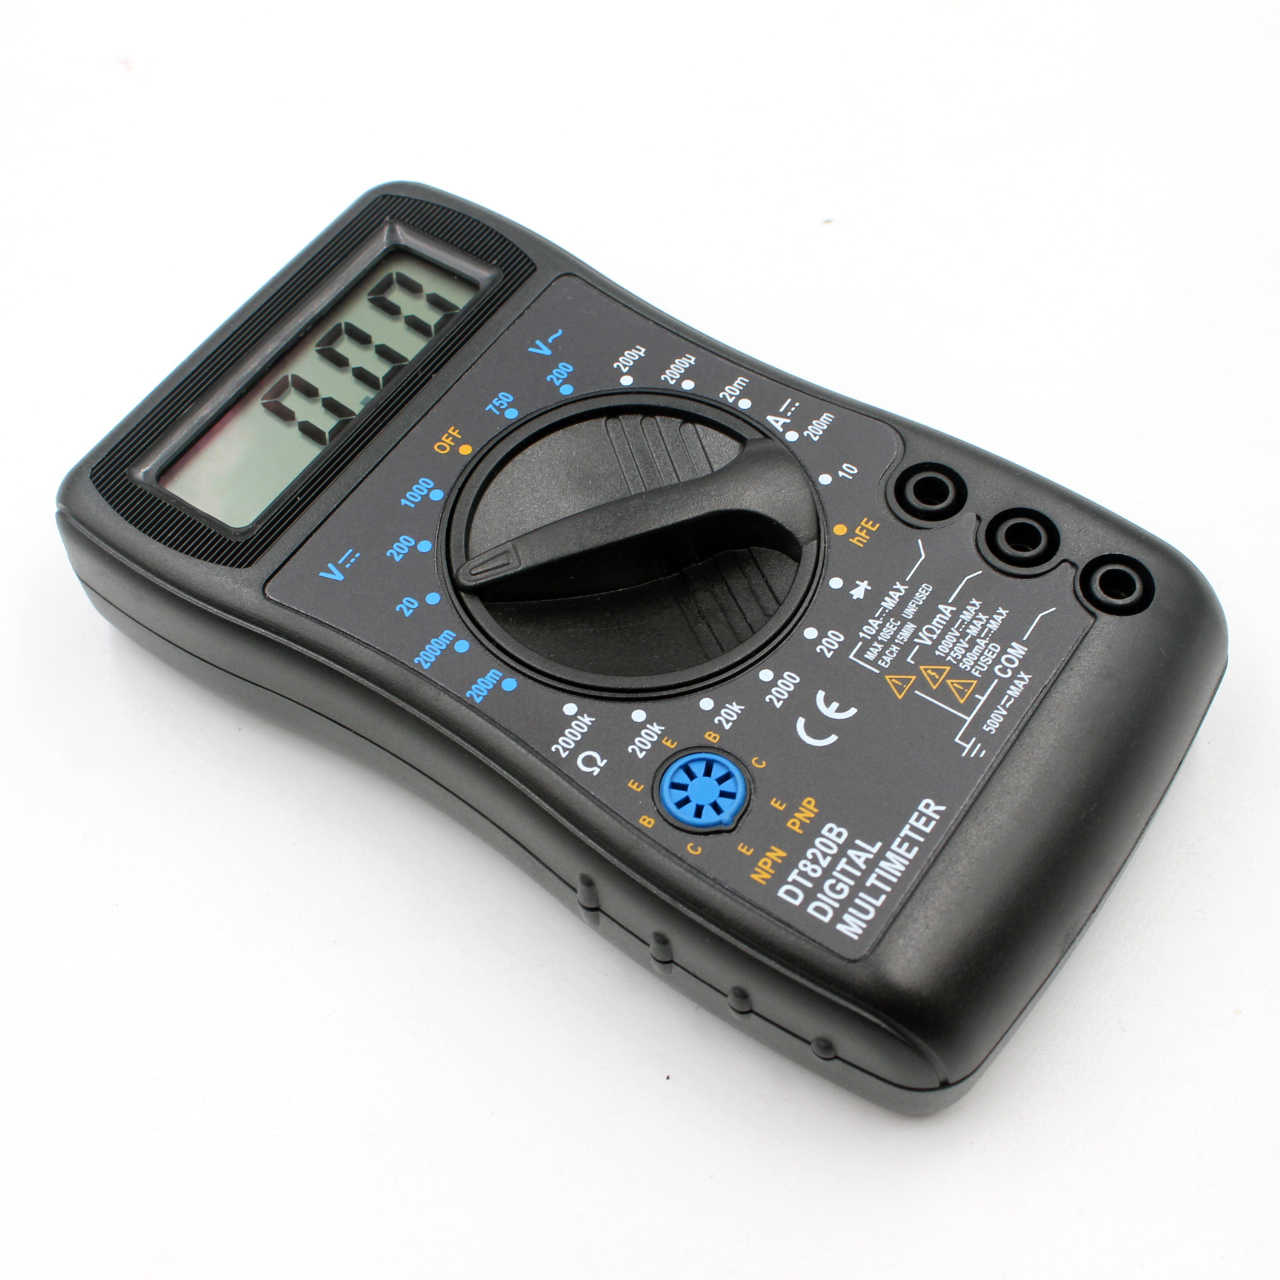 WHDZ DT820B Mini Digitale Multimeter met Overbelasting bescherming Voltmeter Ampere Ohm Tester Probe DC AC LCD Black Gratis verzending